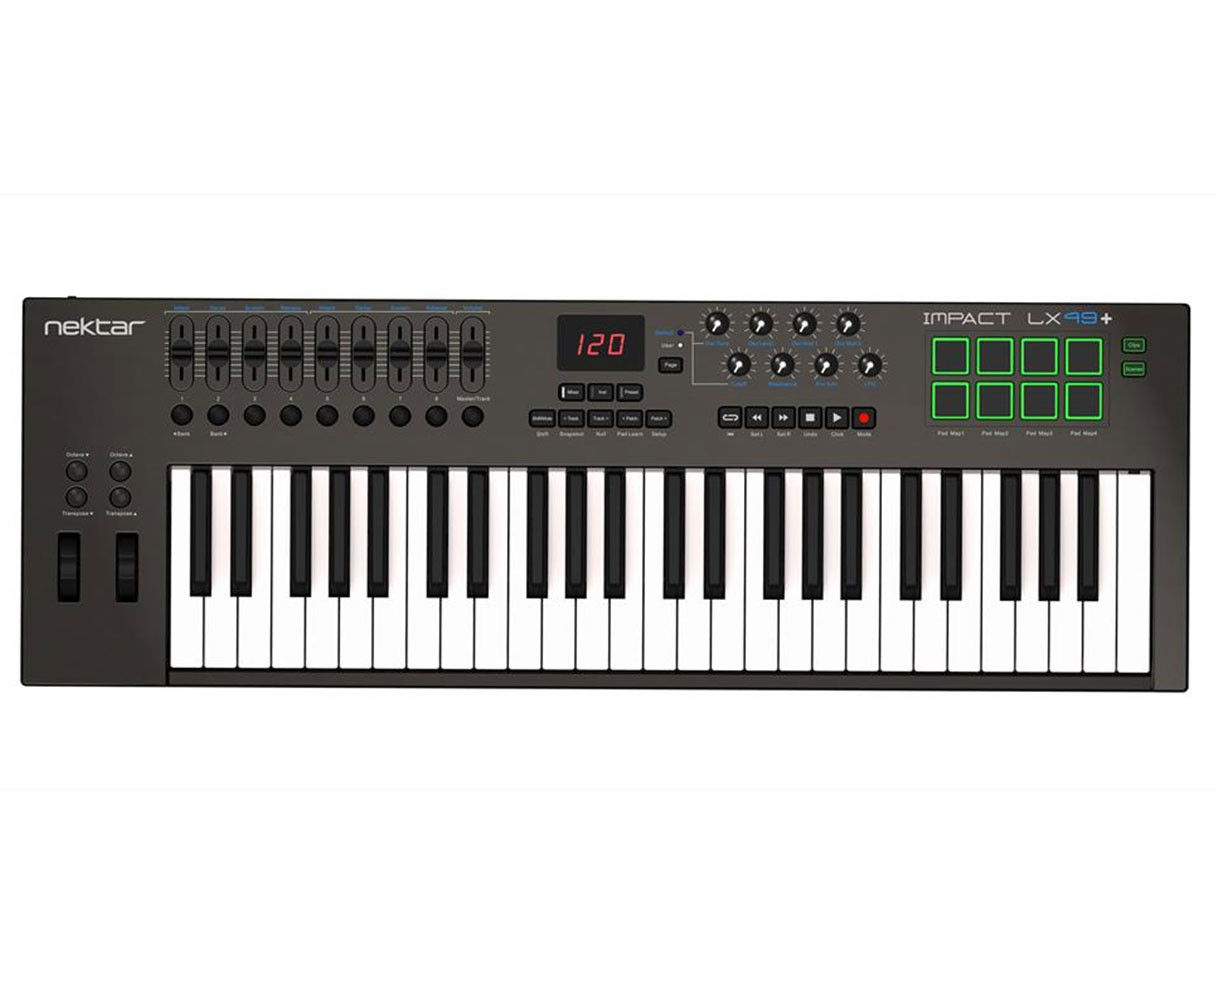 Nektar Impact LX49+ 49 Key Keyboard MIDI controller with built in DAW integration (Open Box)